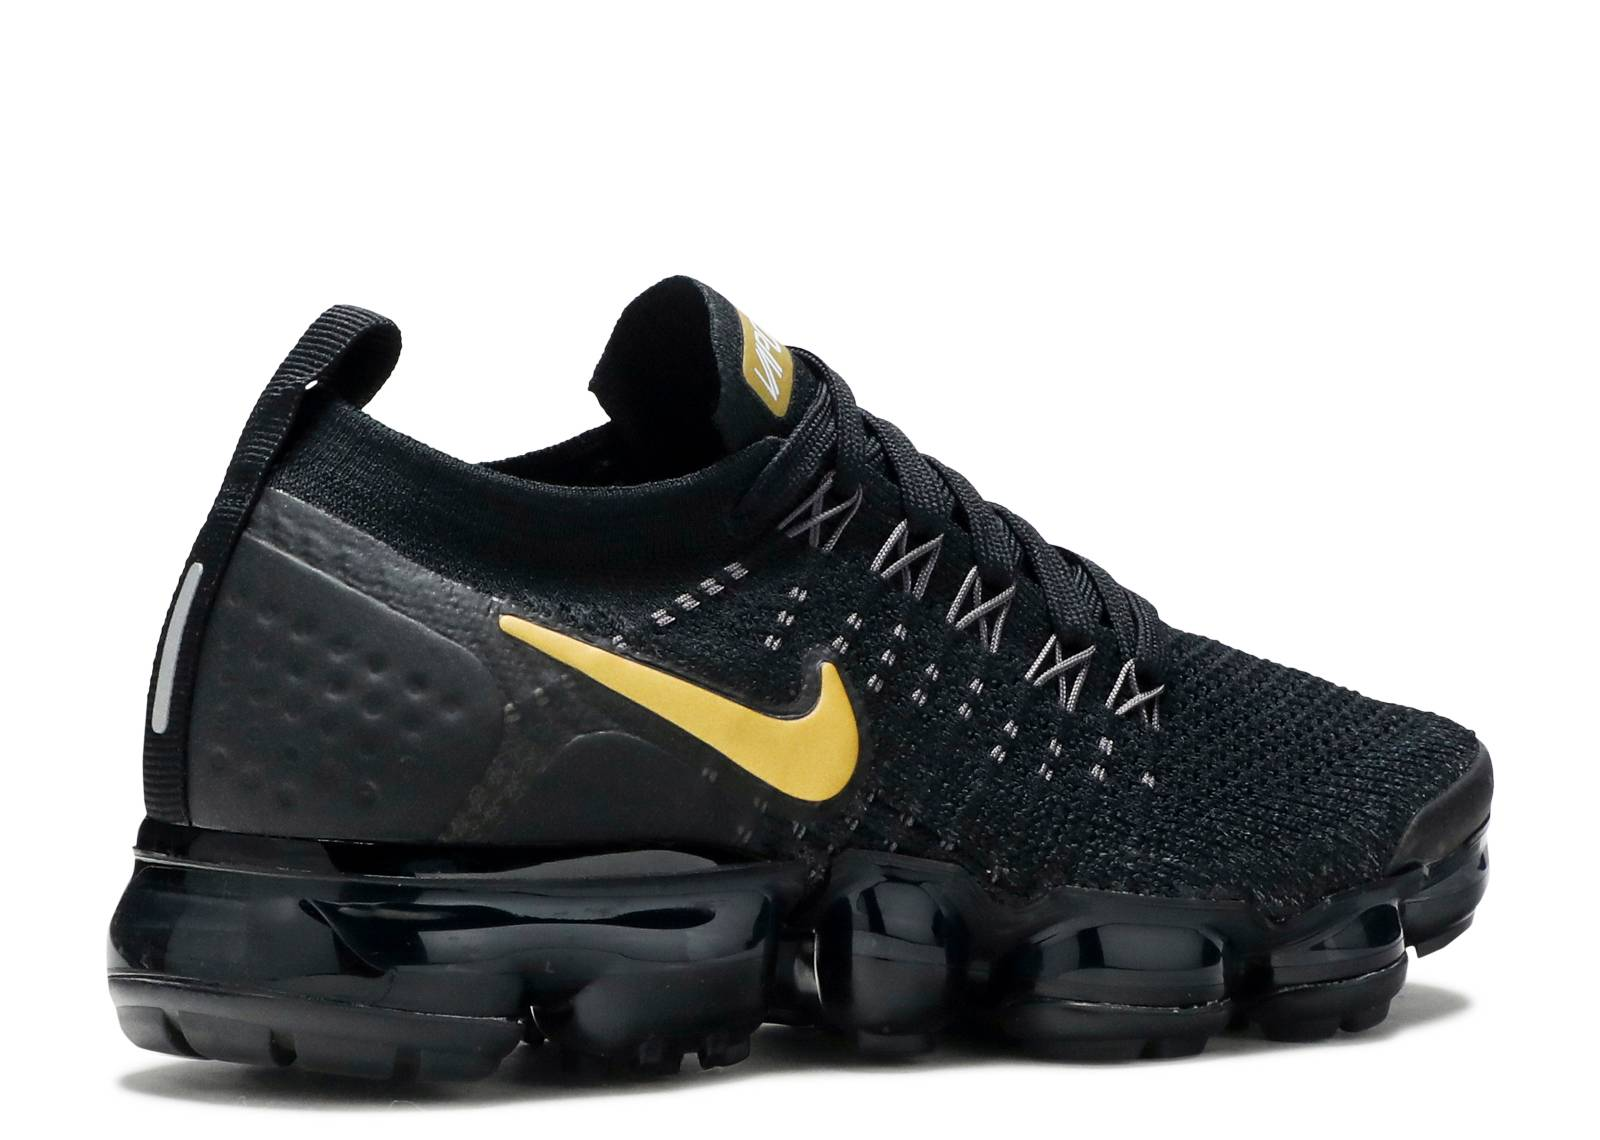 e2b5c4064982 W Nike Air Vapormax Flyknit 2 - Nike - 942843 012 - black metallic gold